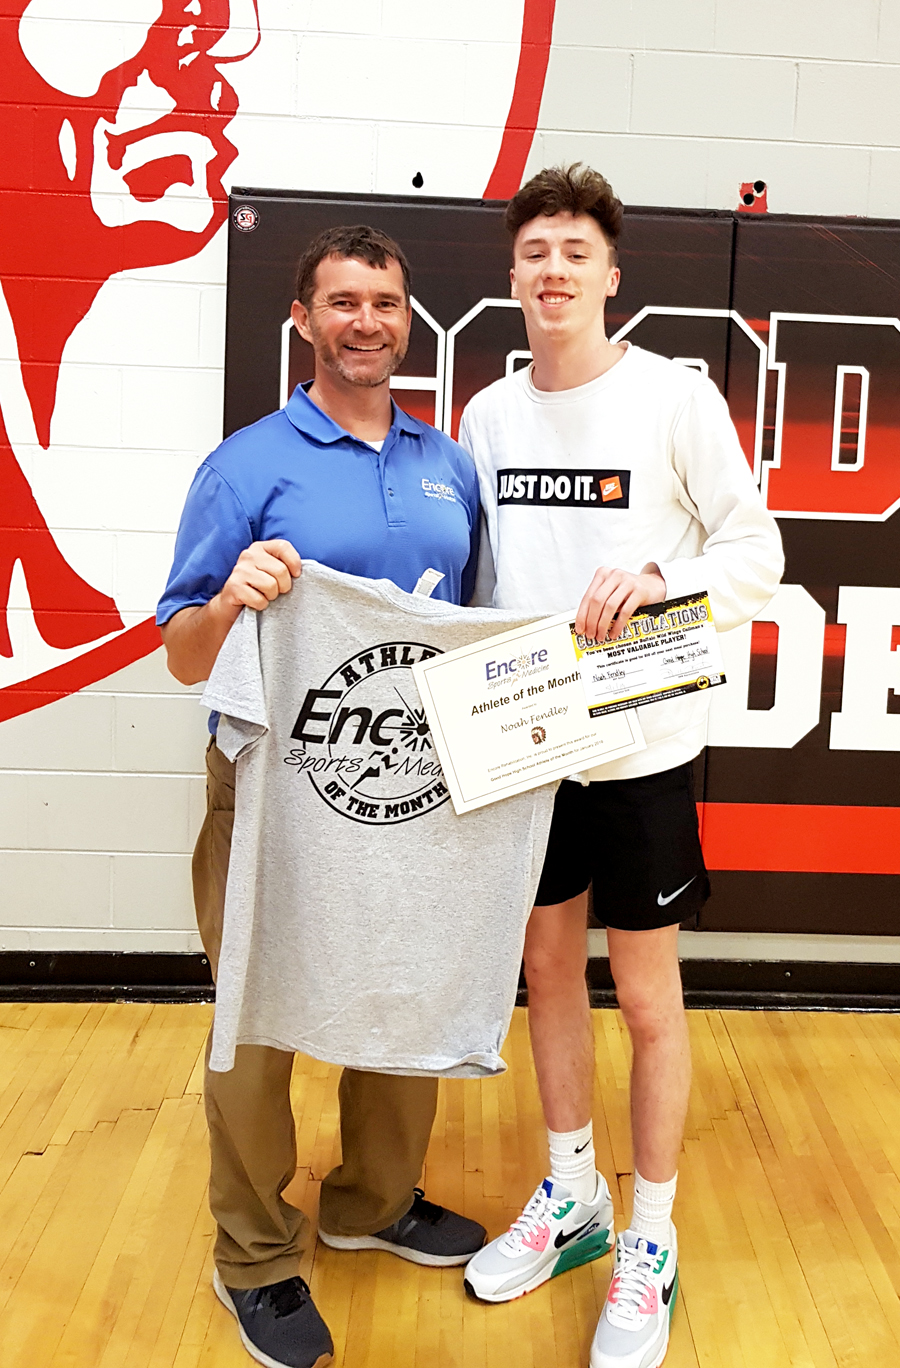 Noah Fendley - January Athlete of the Month for Good Hope High School and Encore Rehabilitation-Culllman #EncoreRehab